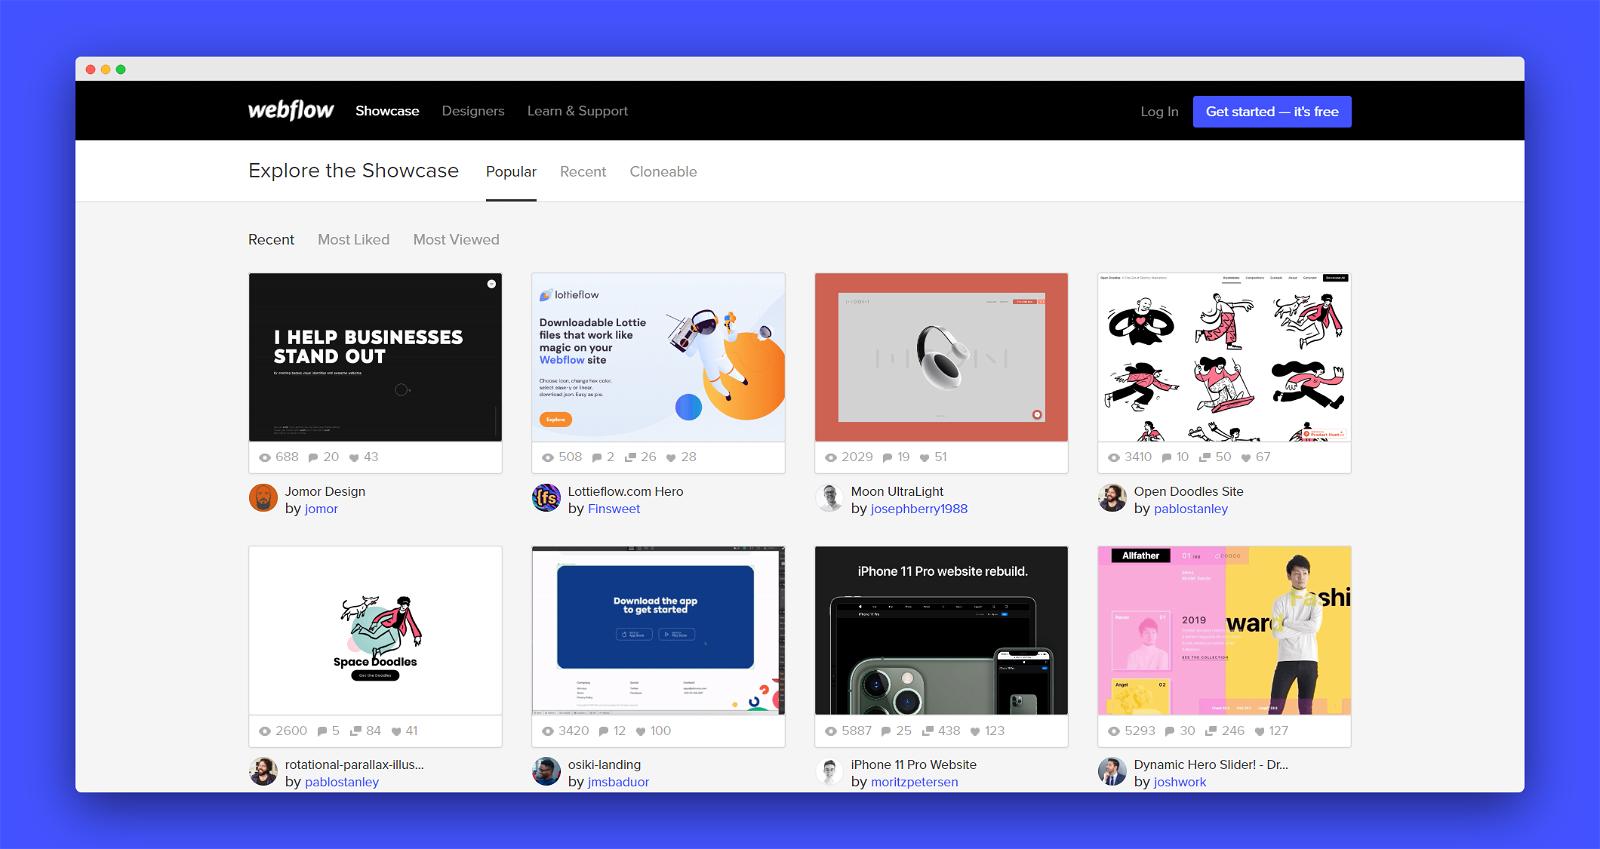 Webflow Screenshot 3